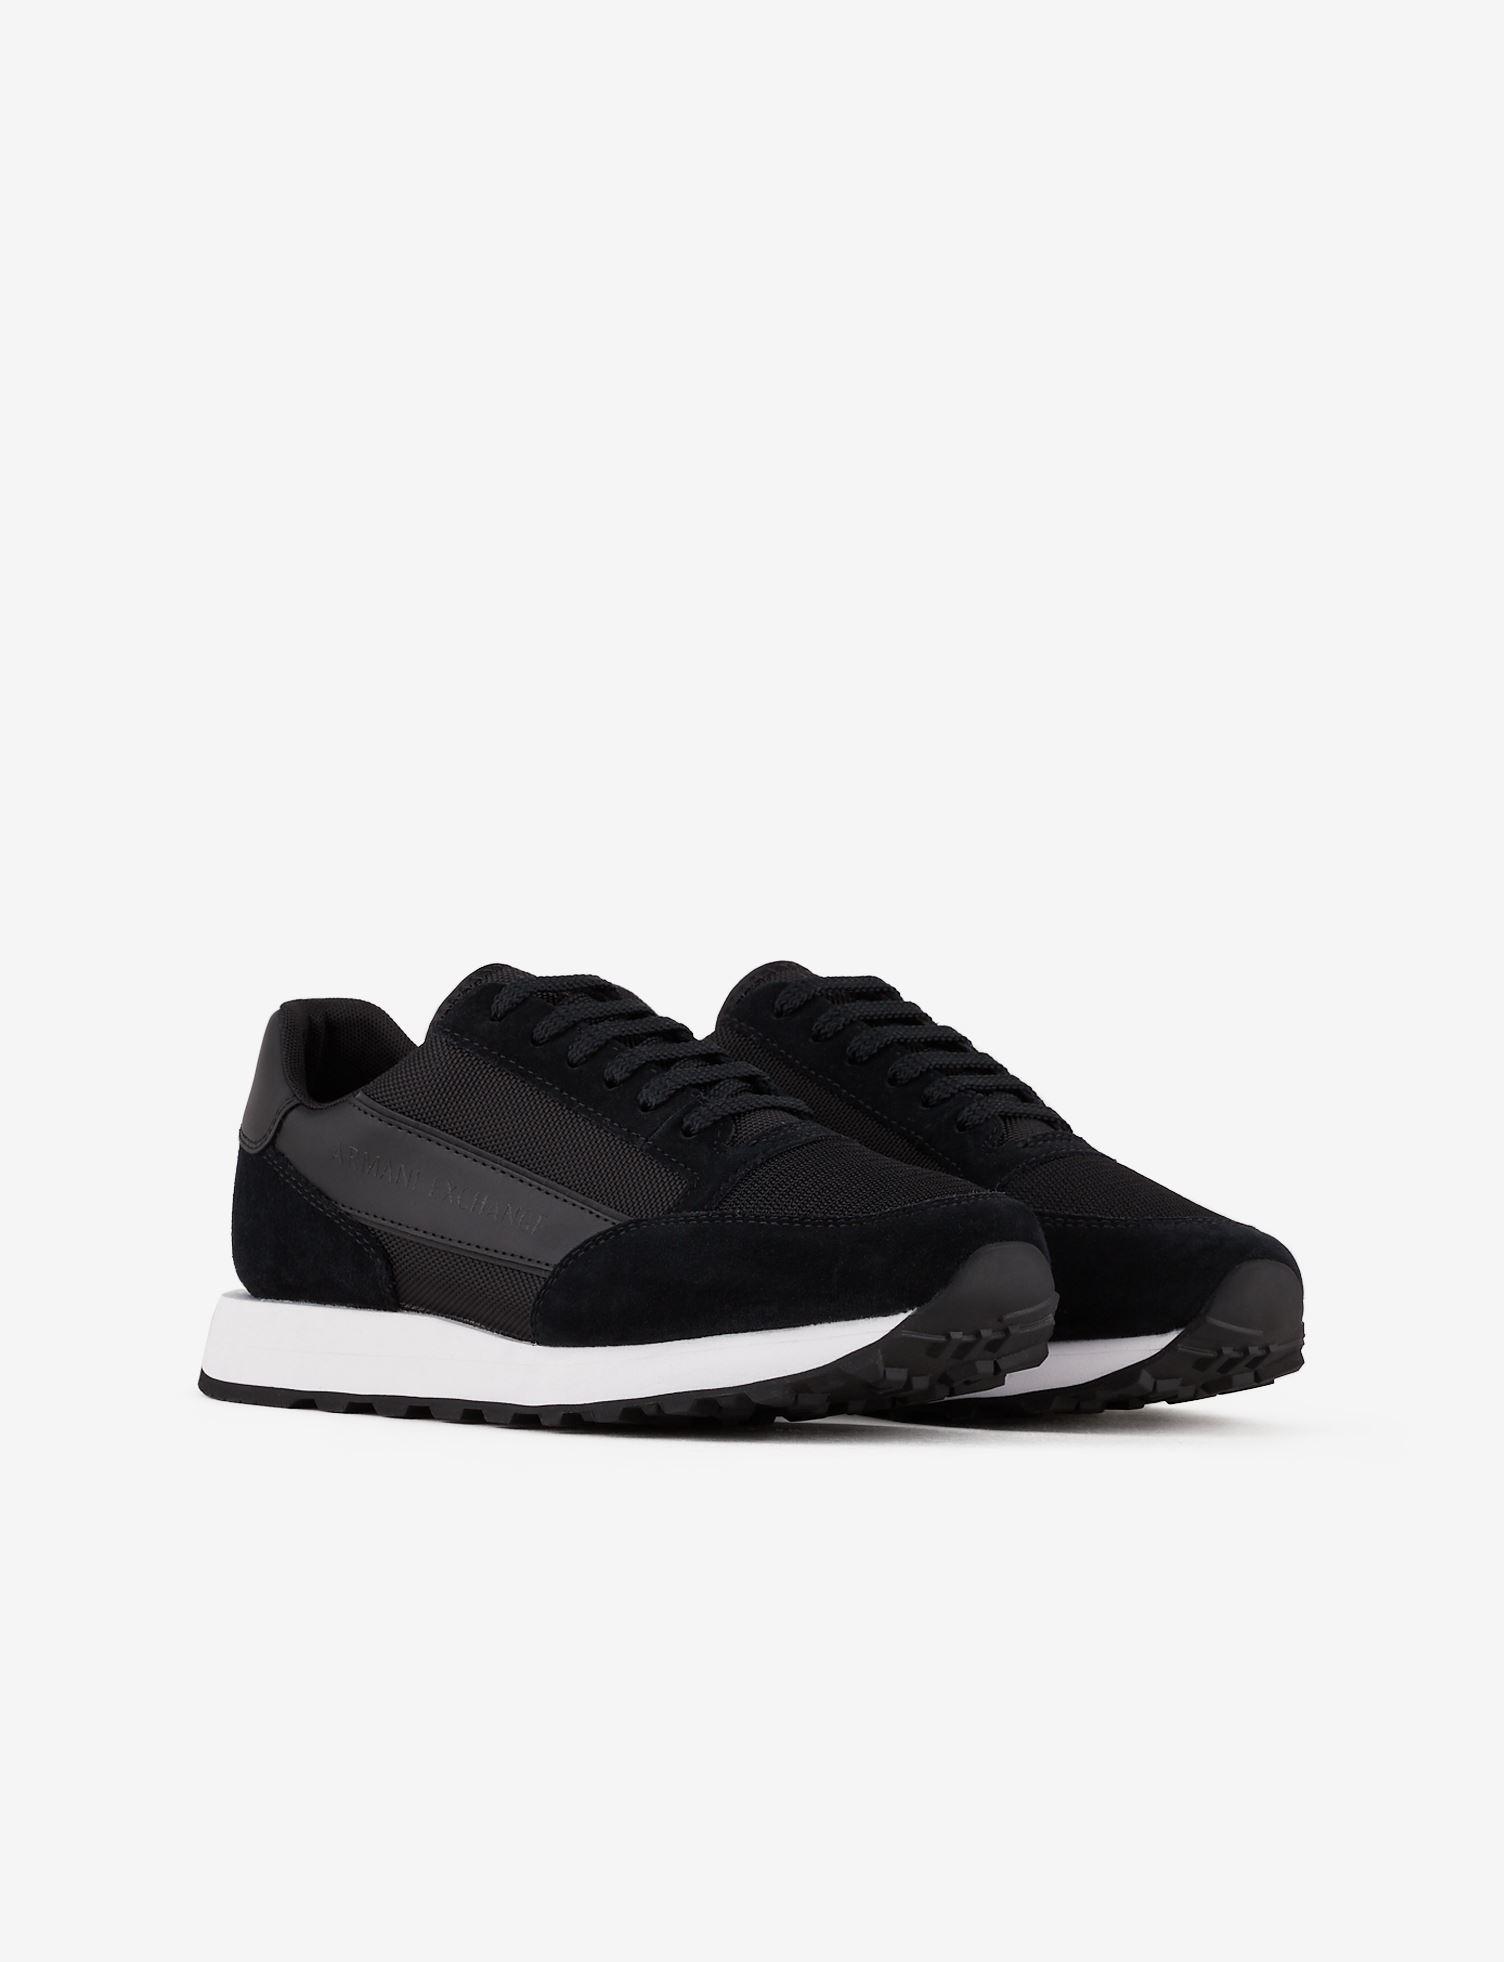 Sneaker in pelle Armani Exchange ARMANI EXCHANGE   Scarpe   XUX083-XV263R595